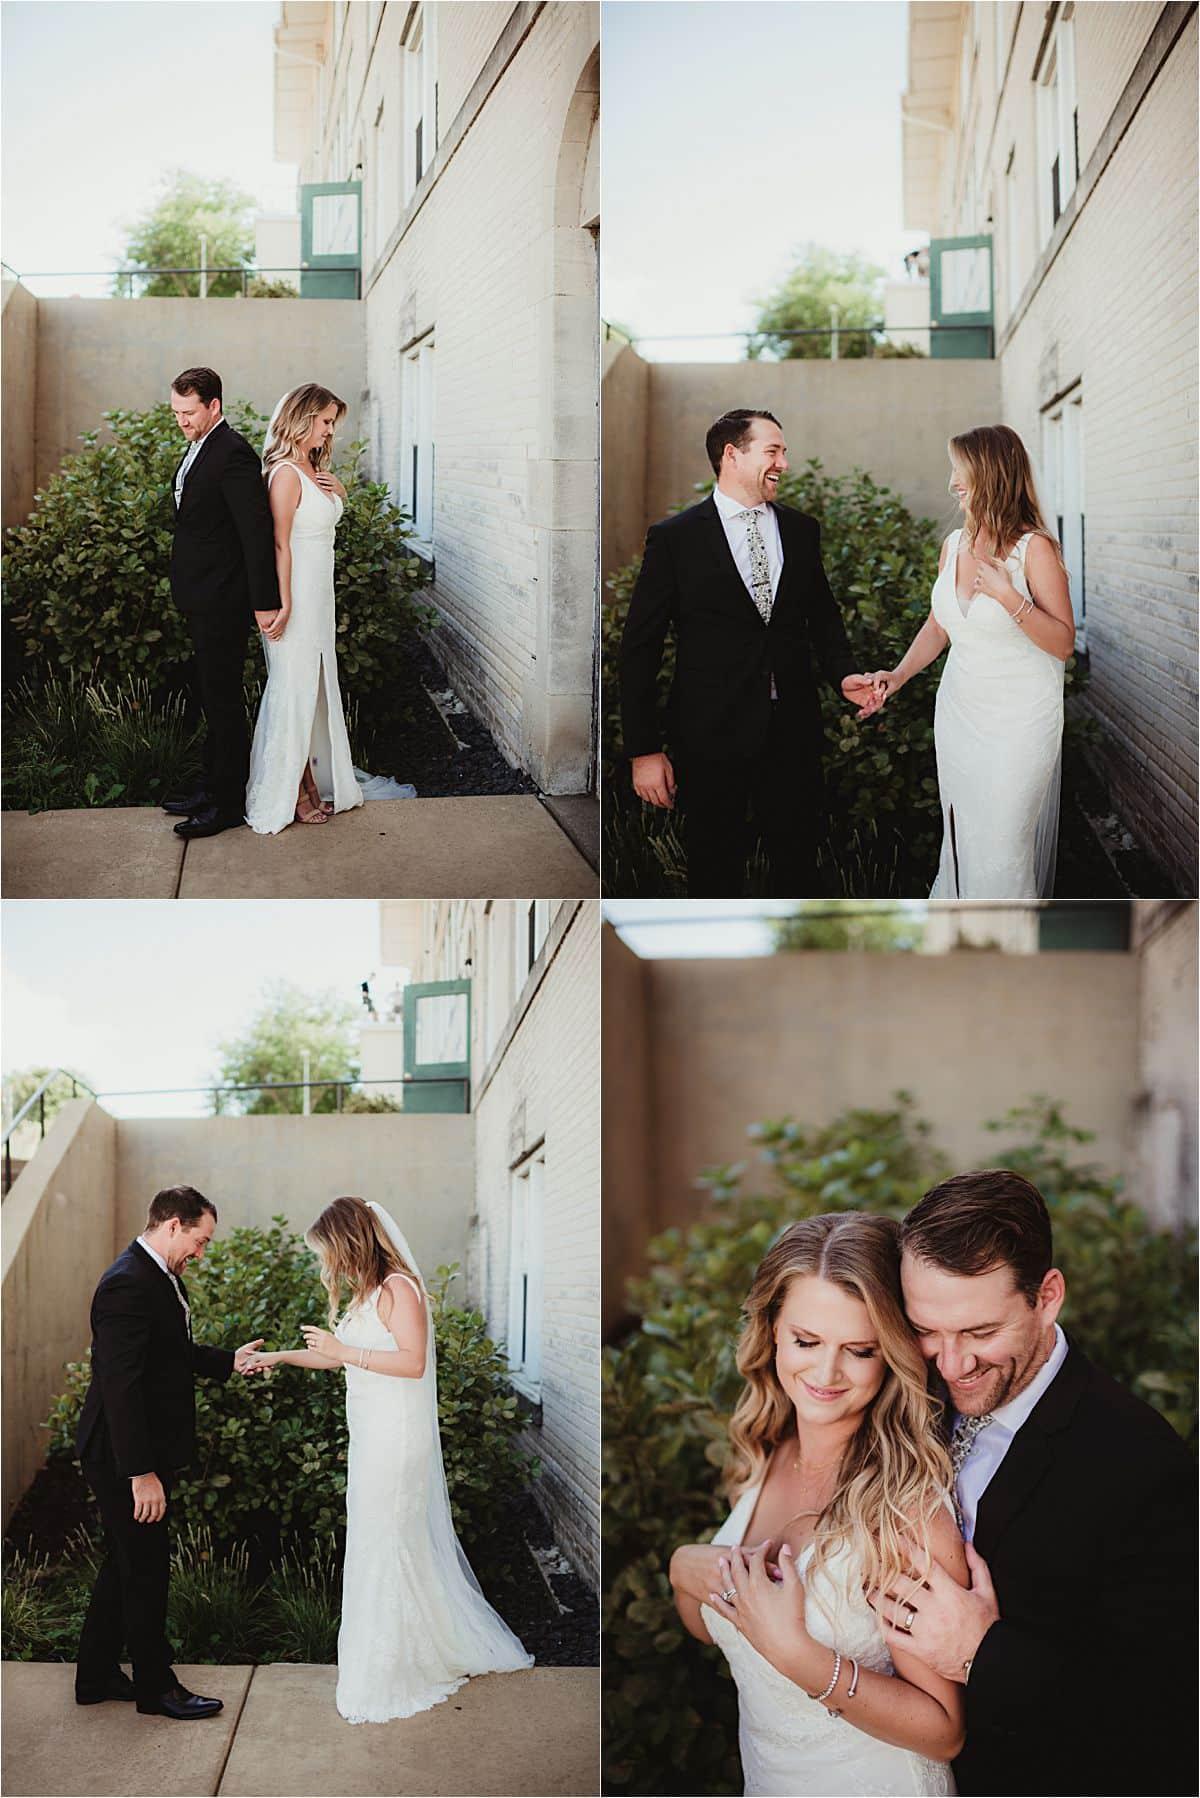 Intimate Outdoor Summer Wedding First Look